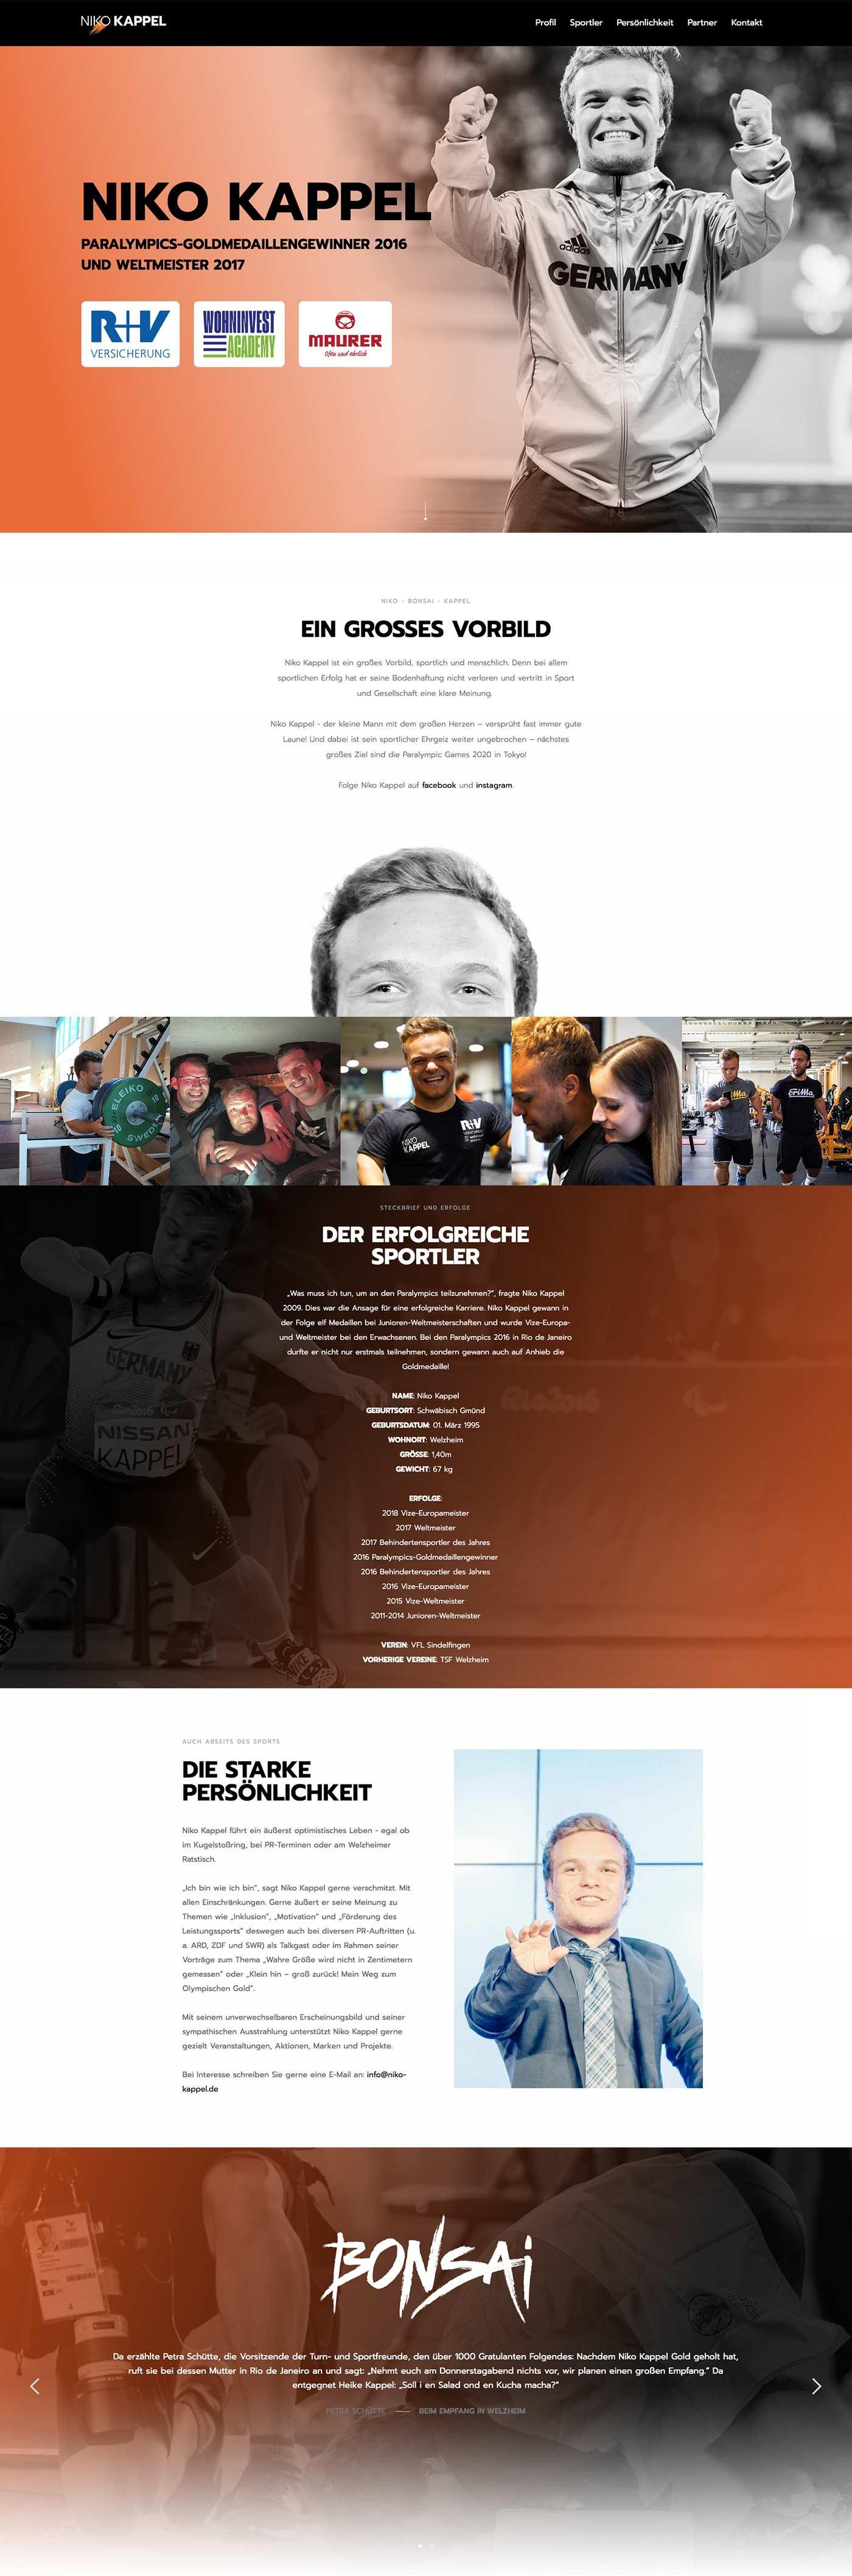 Niko Kappel - Webseite